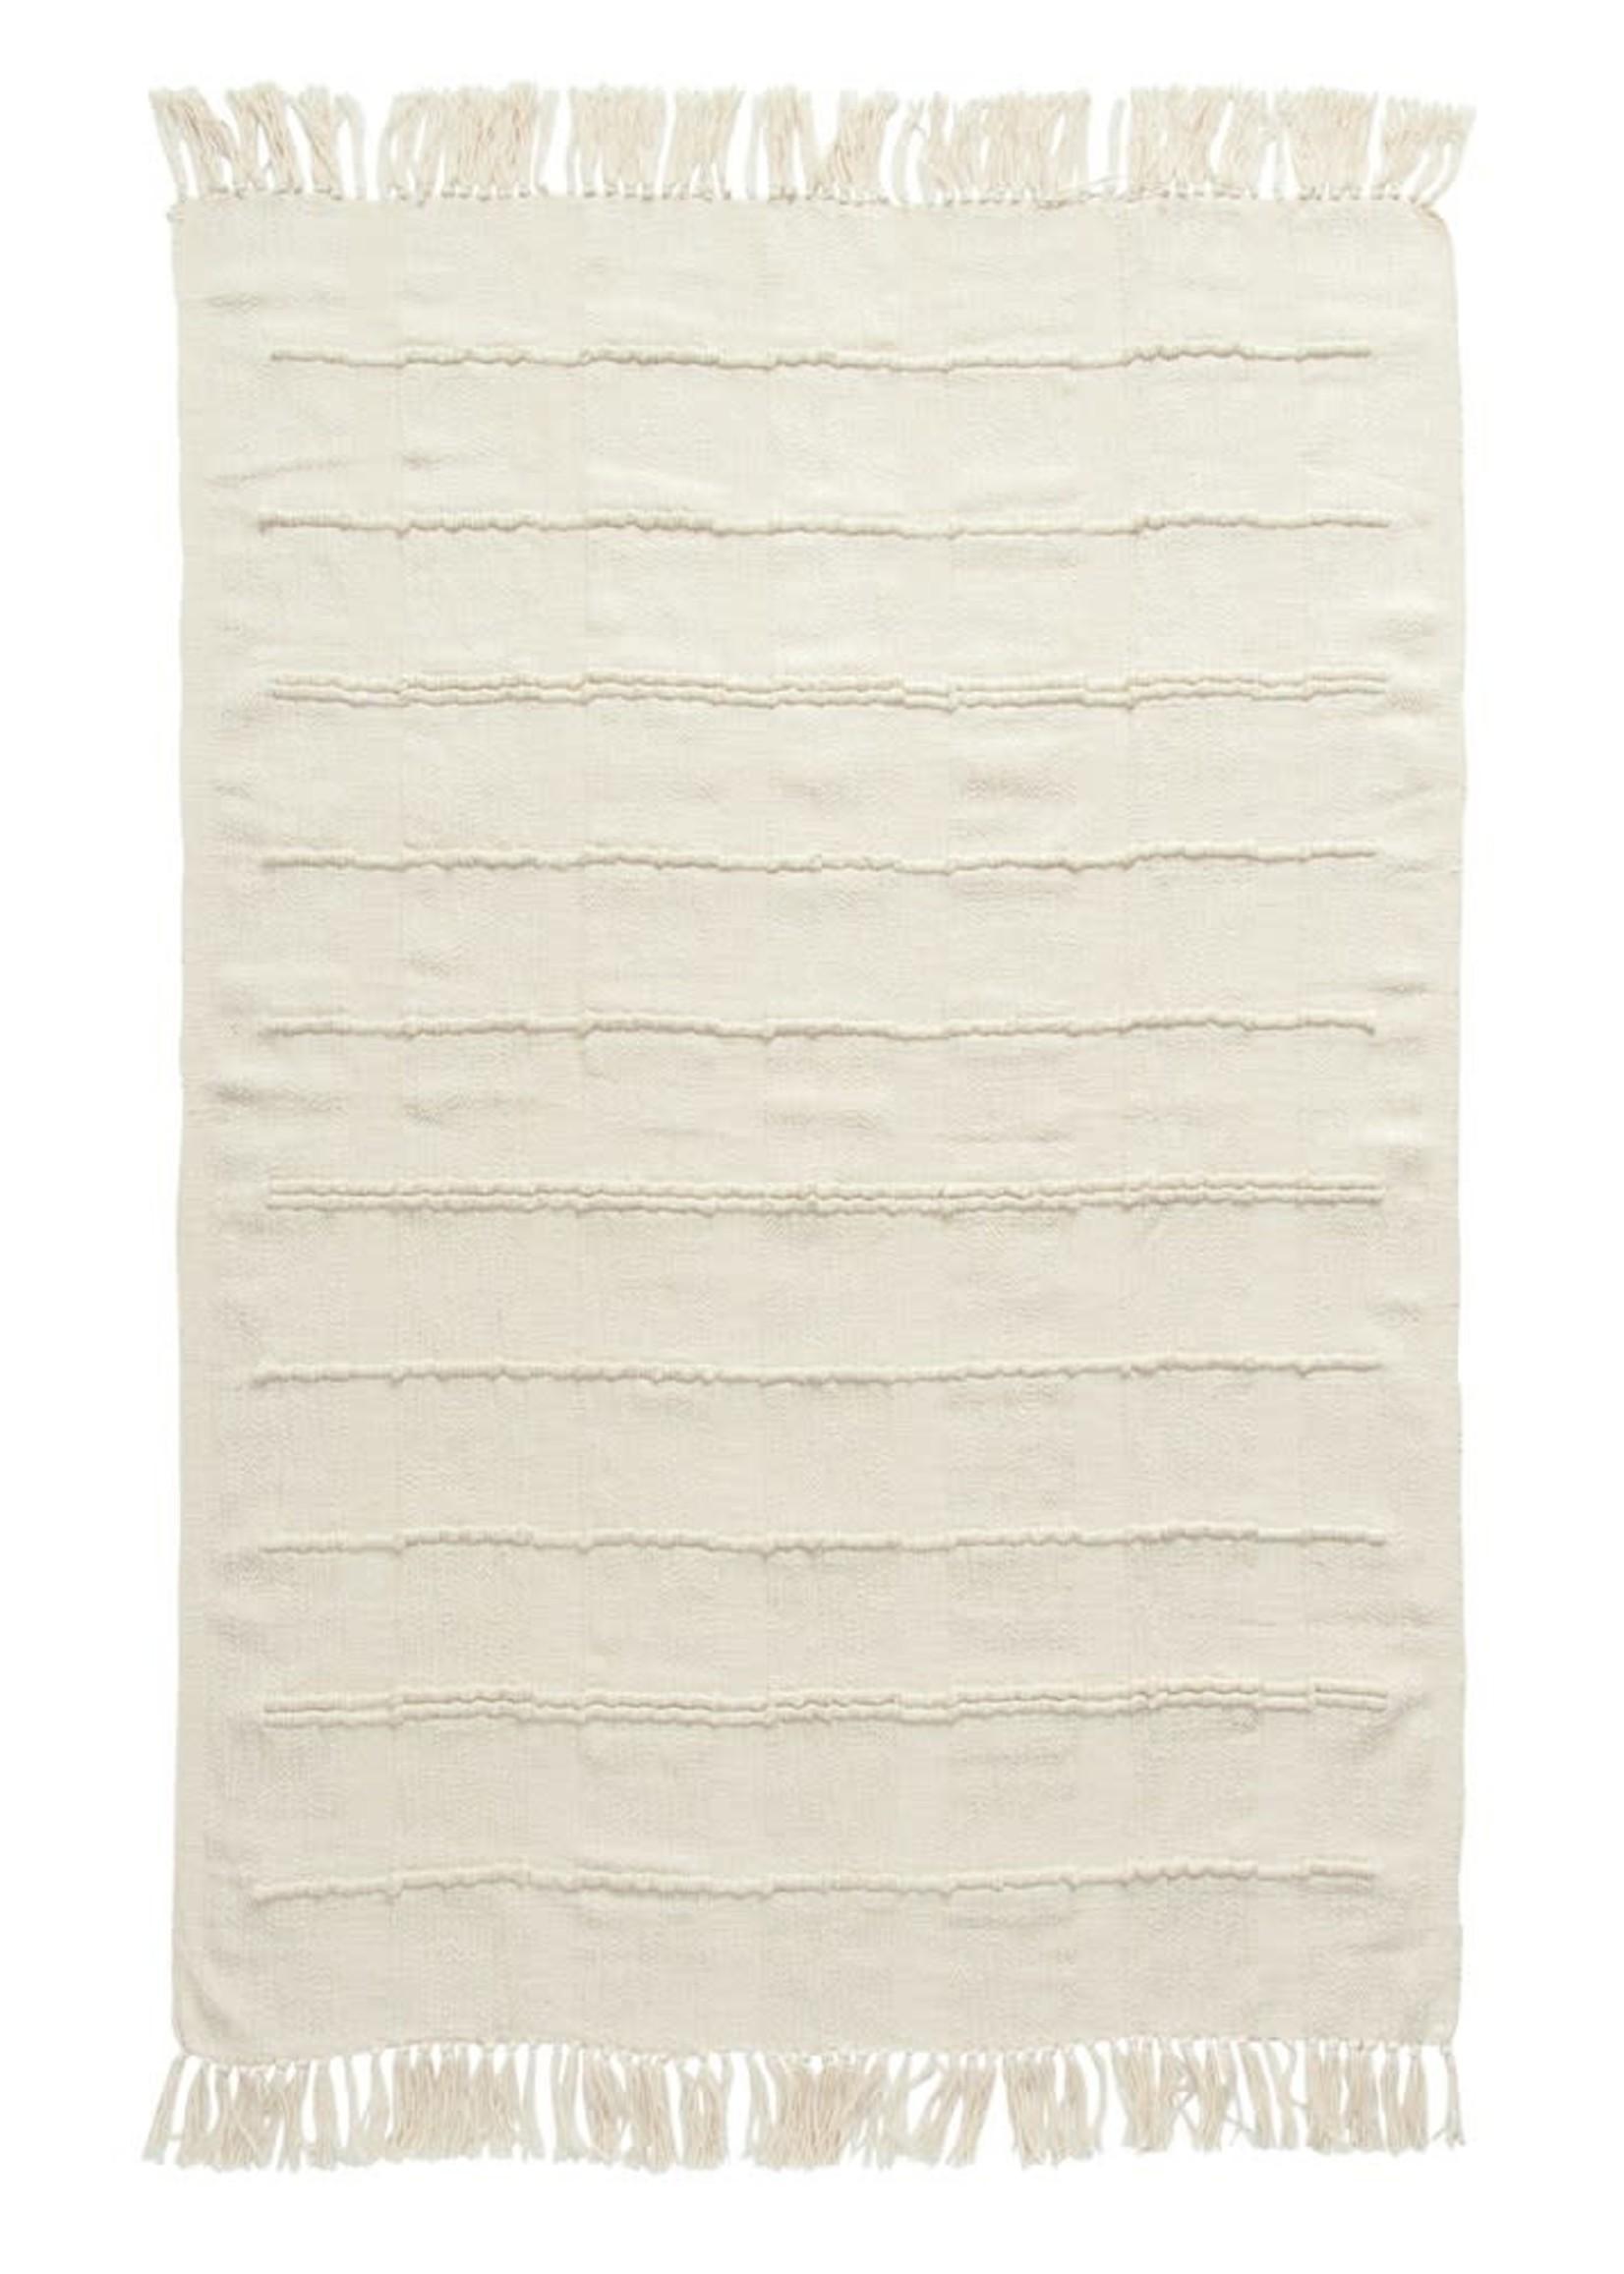 Cotton Blend Chenille Throw, Cream Color